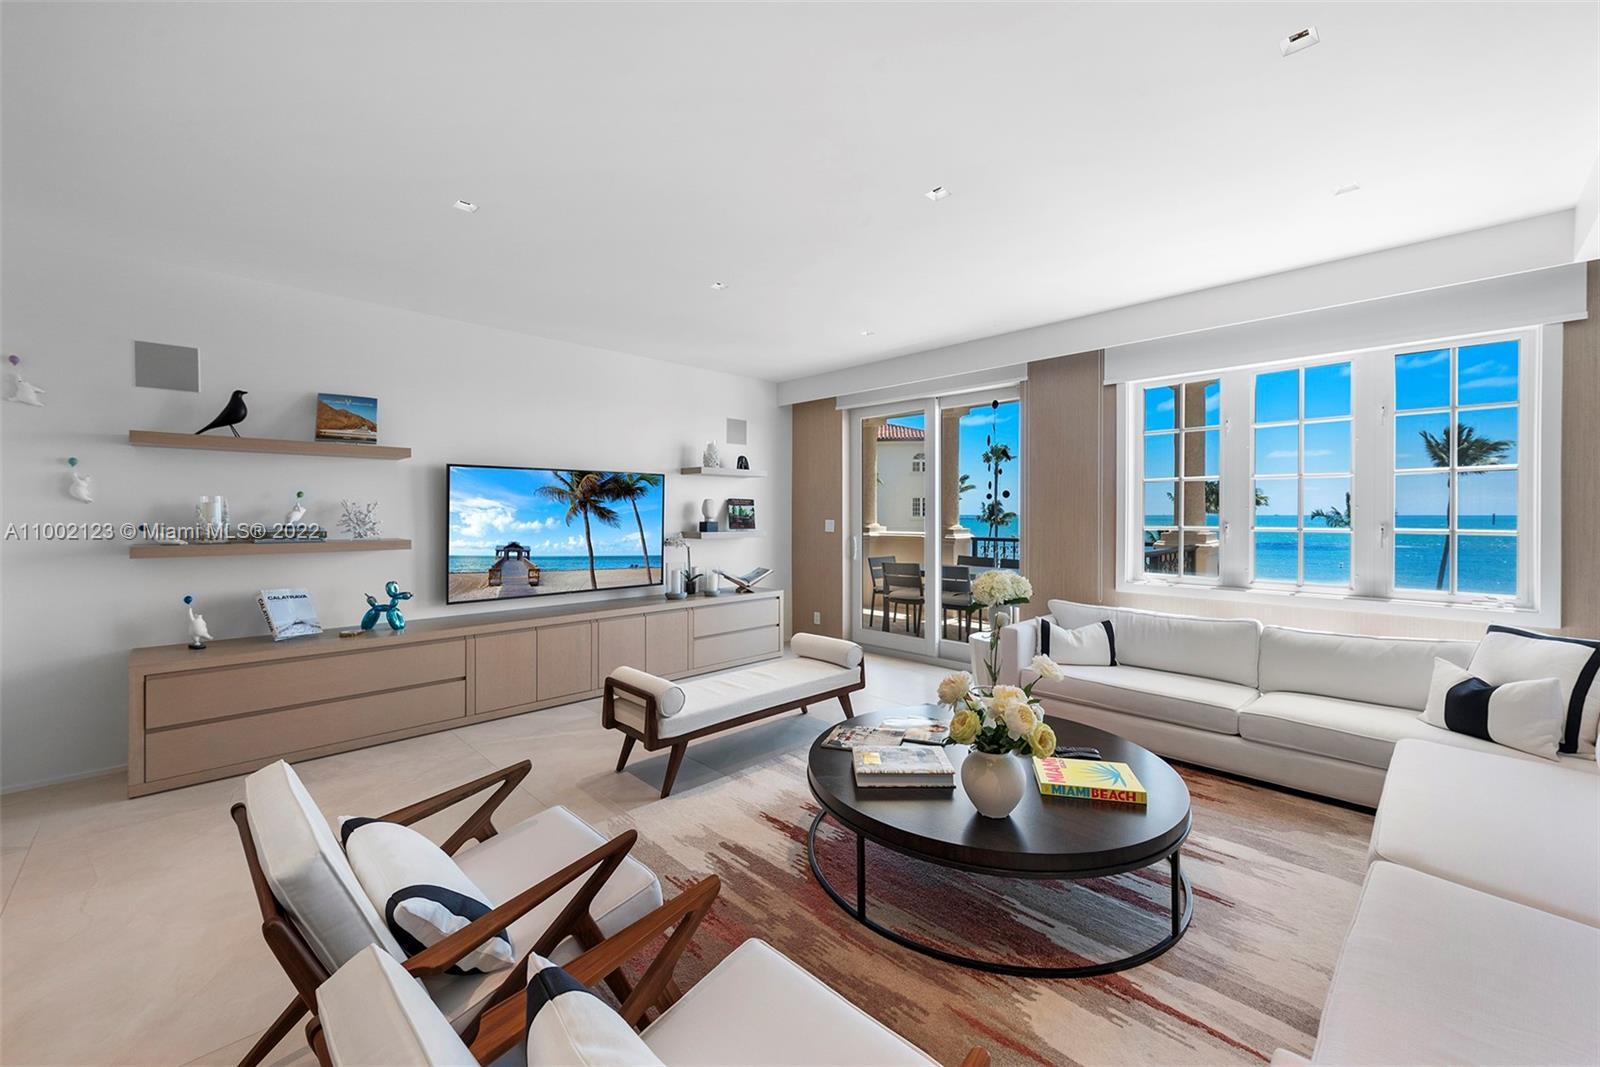 19242 Fisher island dr-19242 miami-beach-fl-33109-a11002123-Pic01